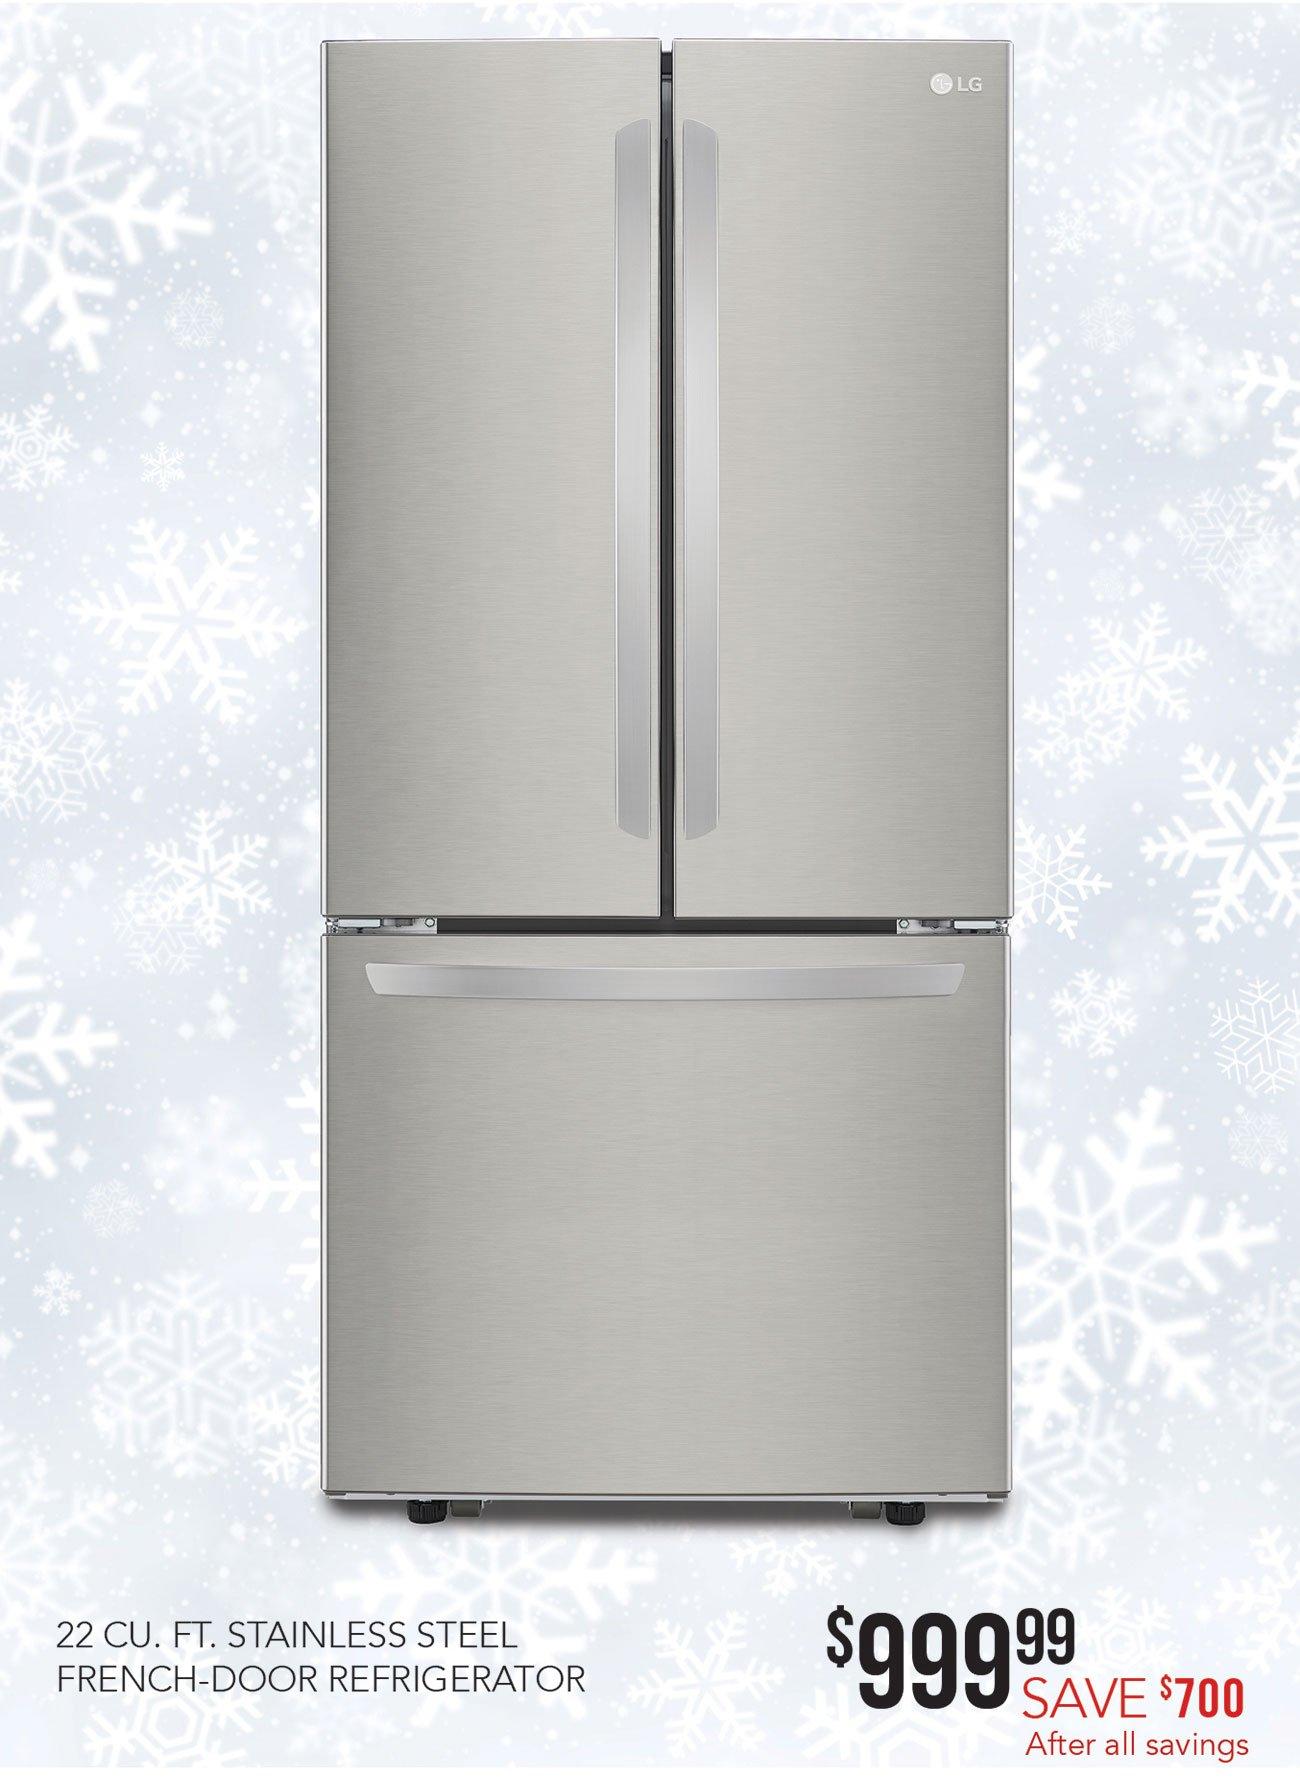 stainless-steel-french-door-refrigerator